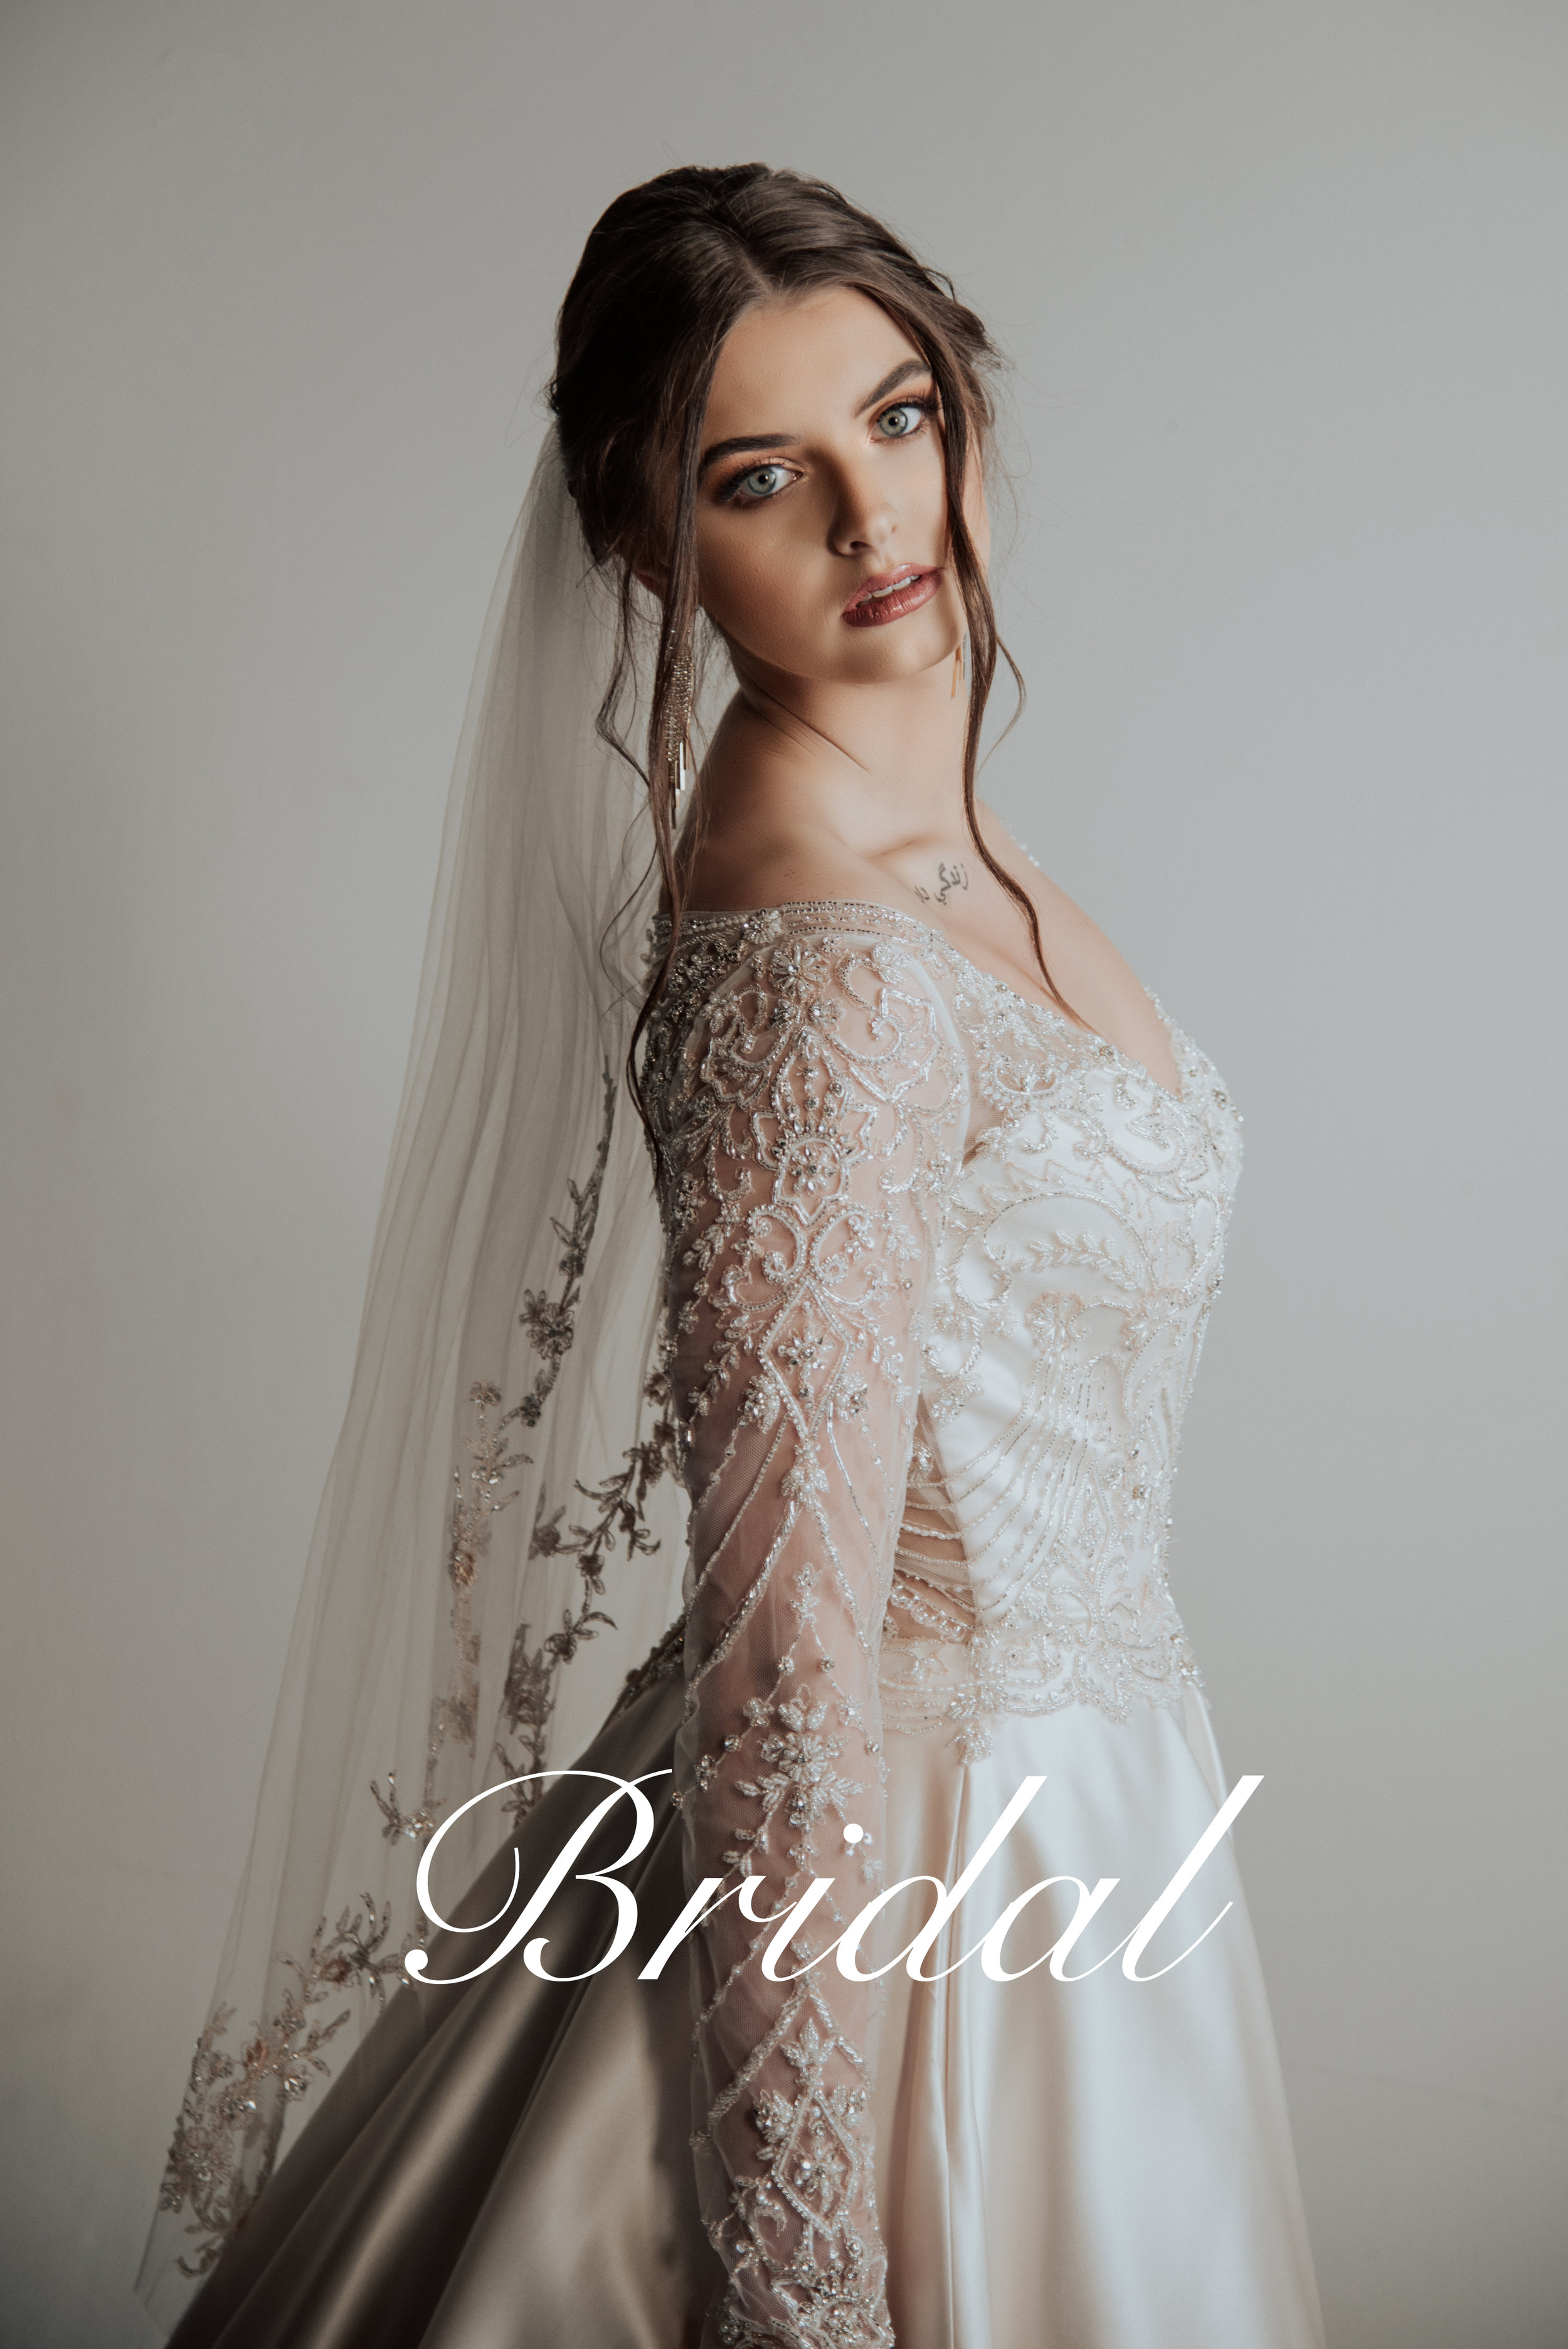 Black Tie Bridal Cover.jpg